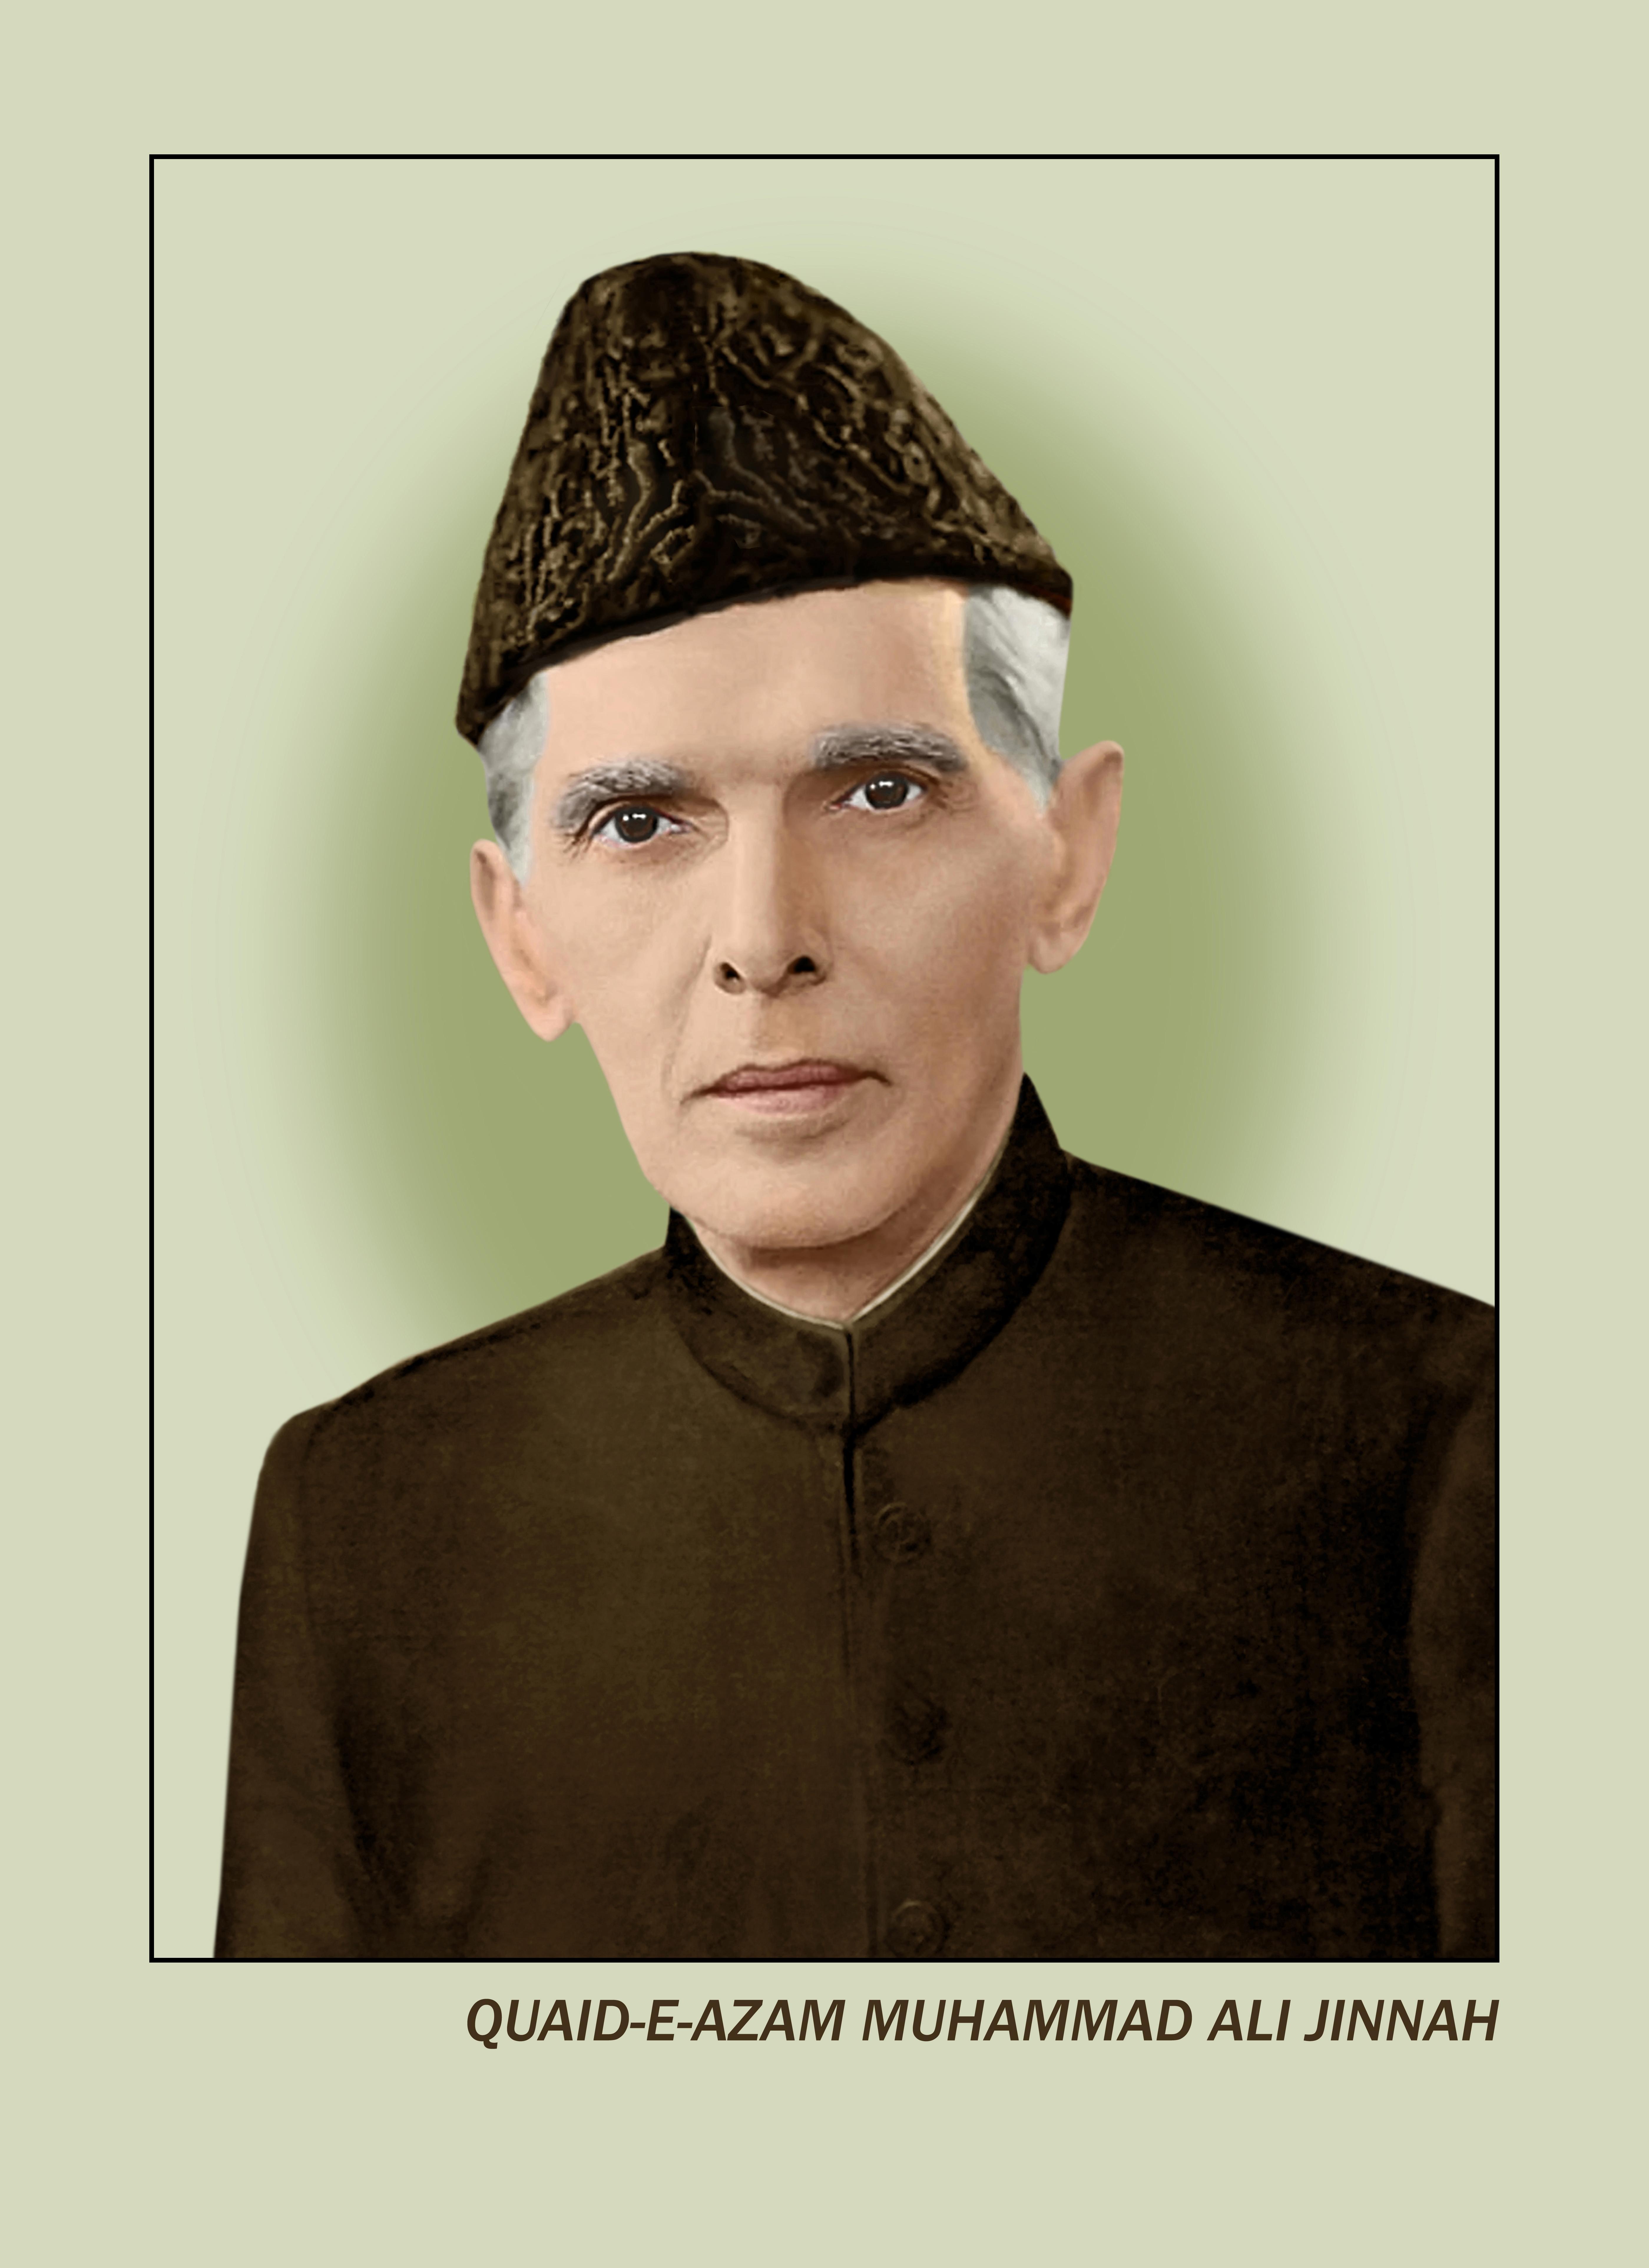 Muhammad Ali Jinnah Biography, Muhammad Ali Jinnah's Famous Quotes